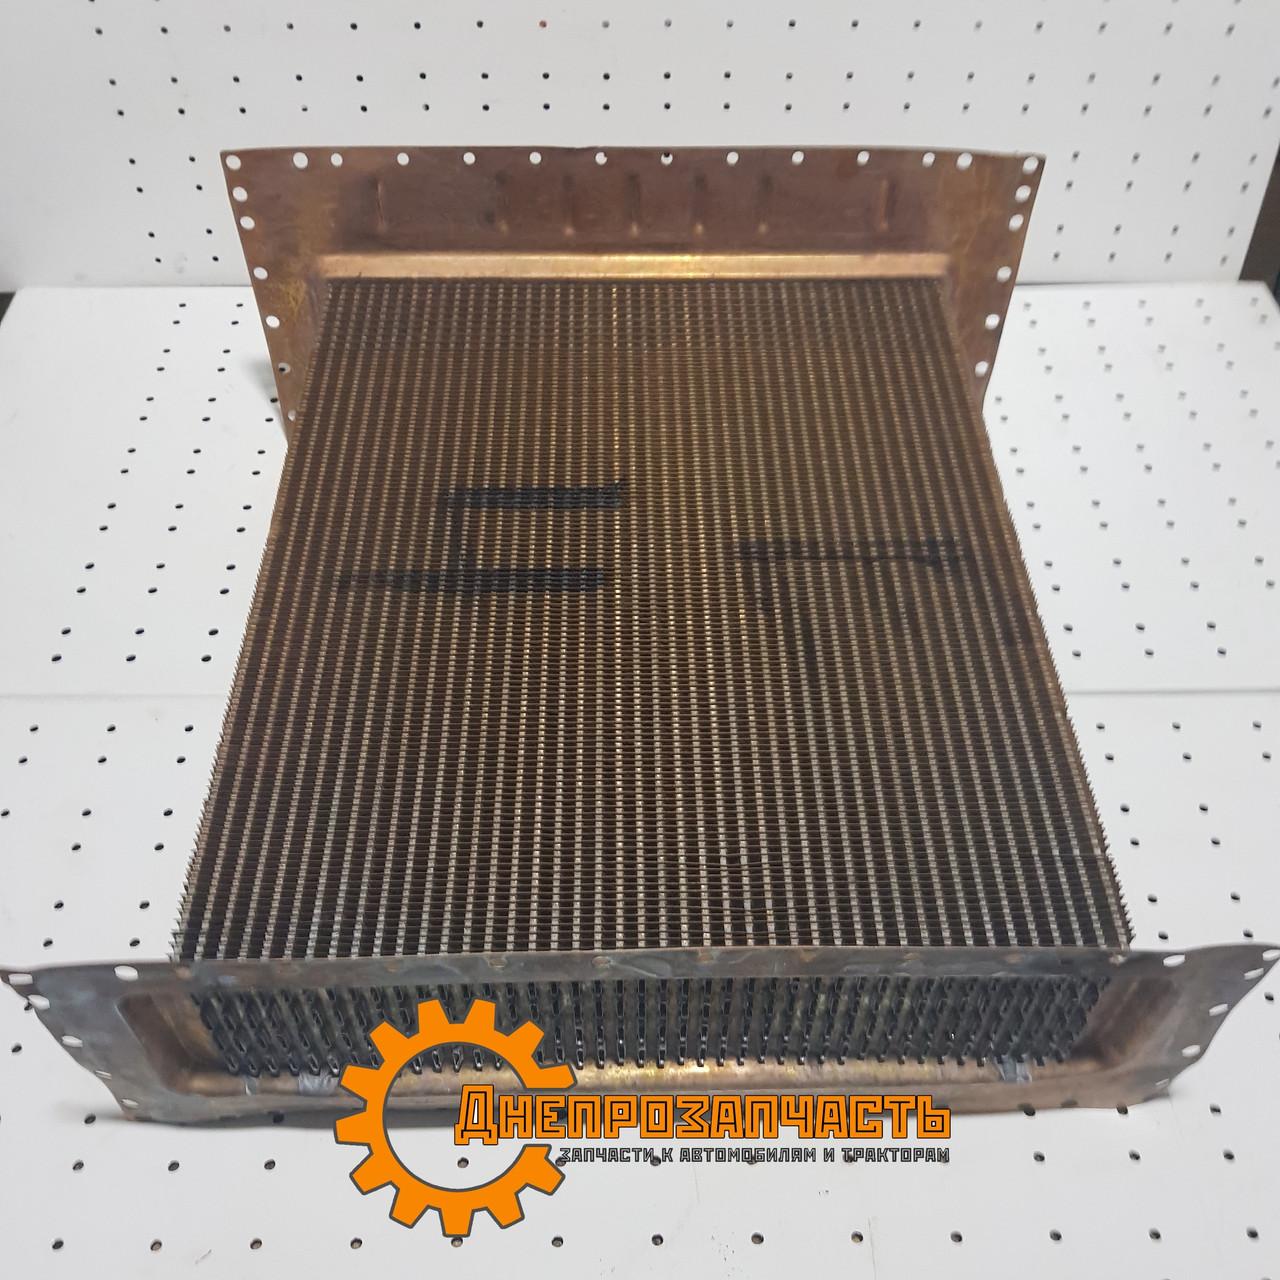 Сердцевина радиатора ЮМЗ латунь (Оренбург)